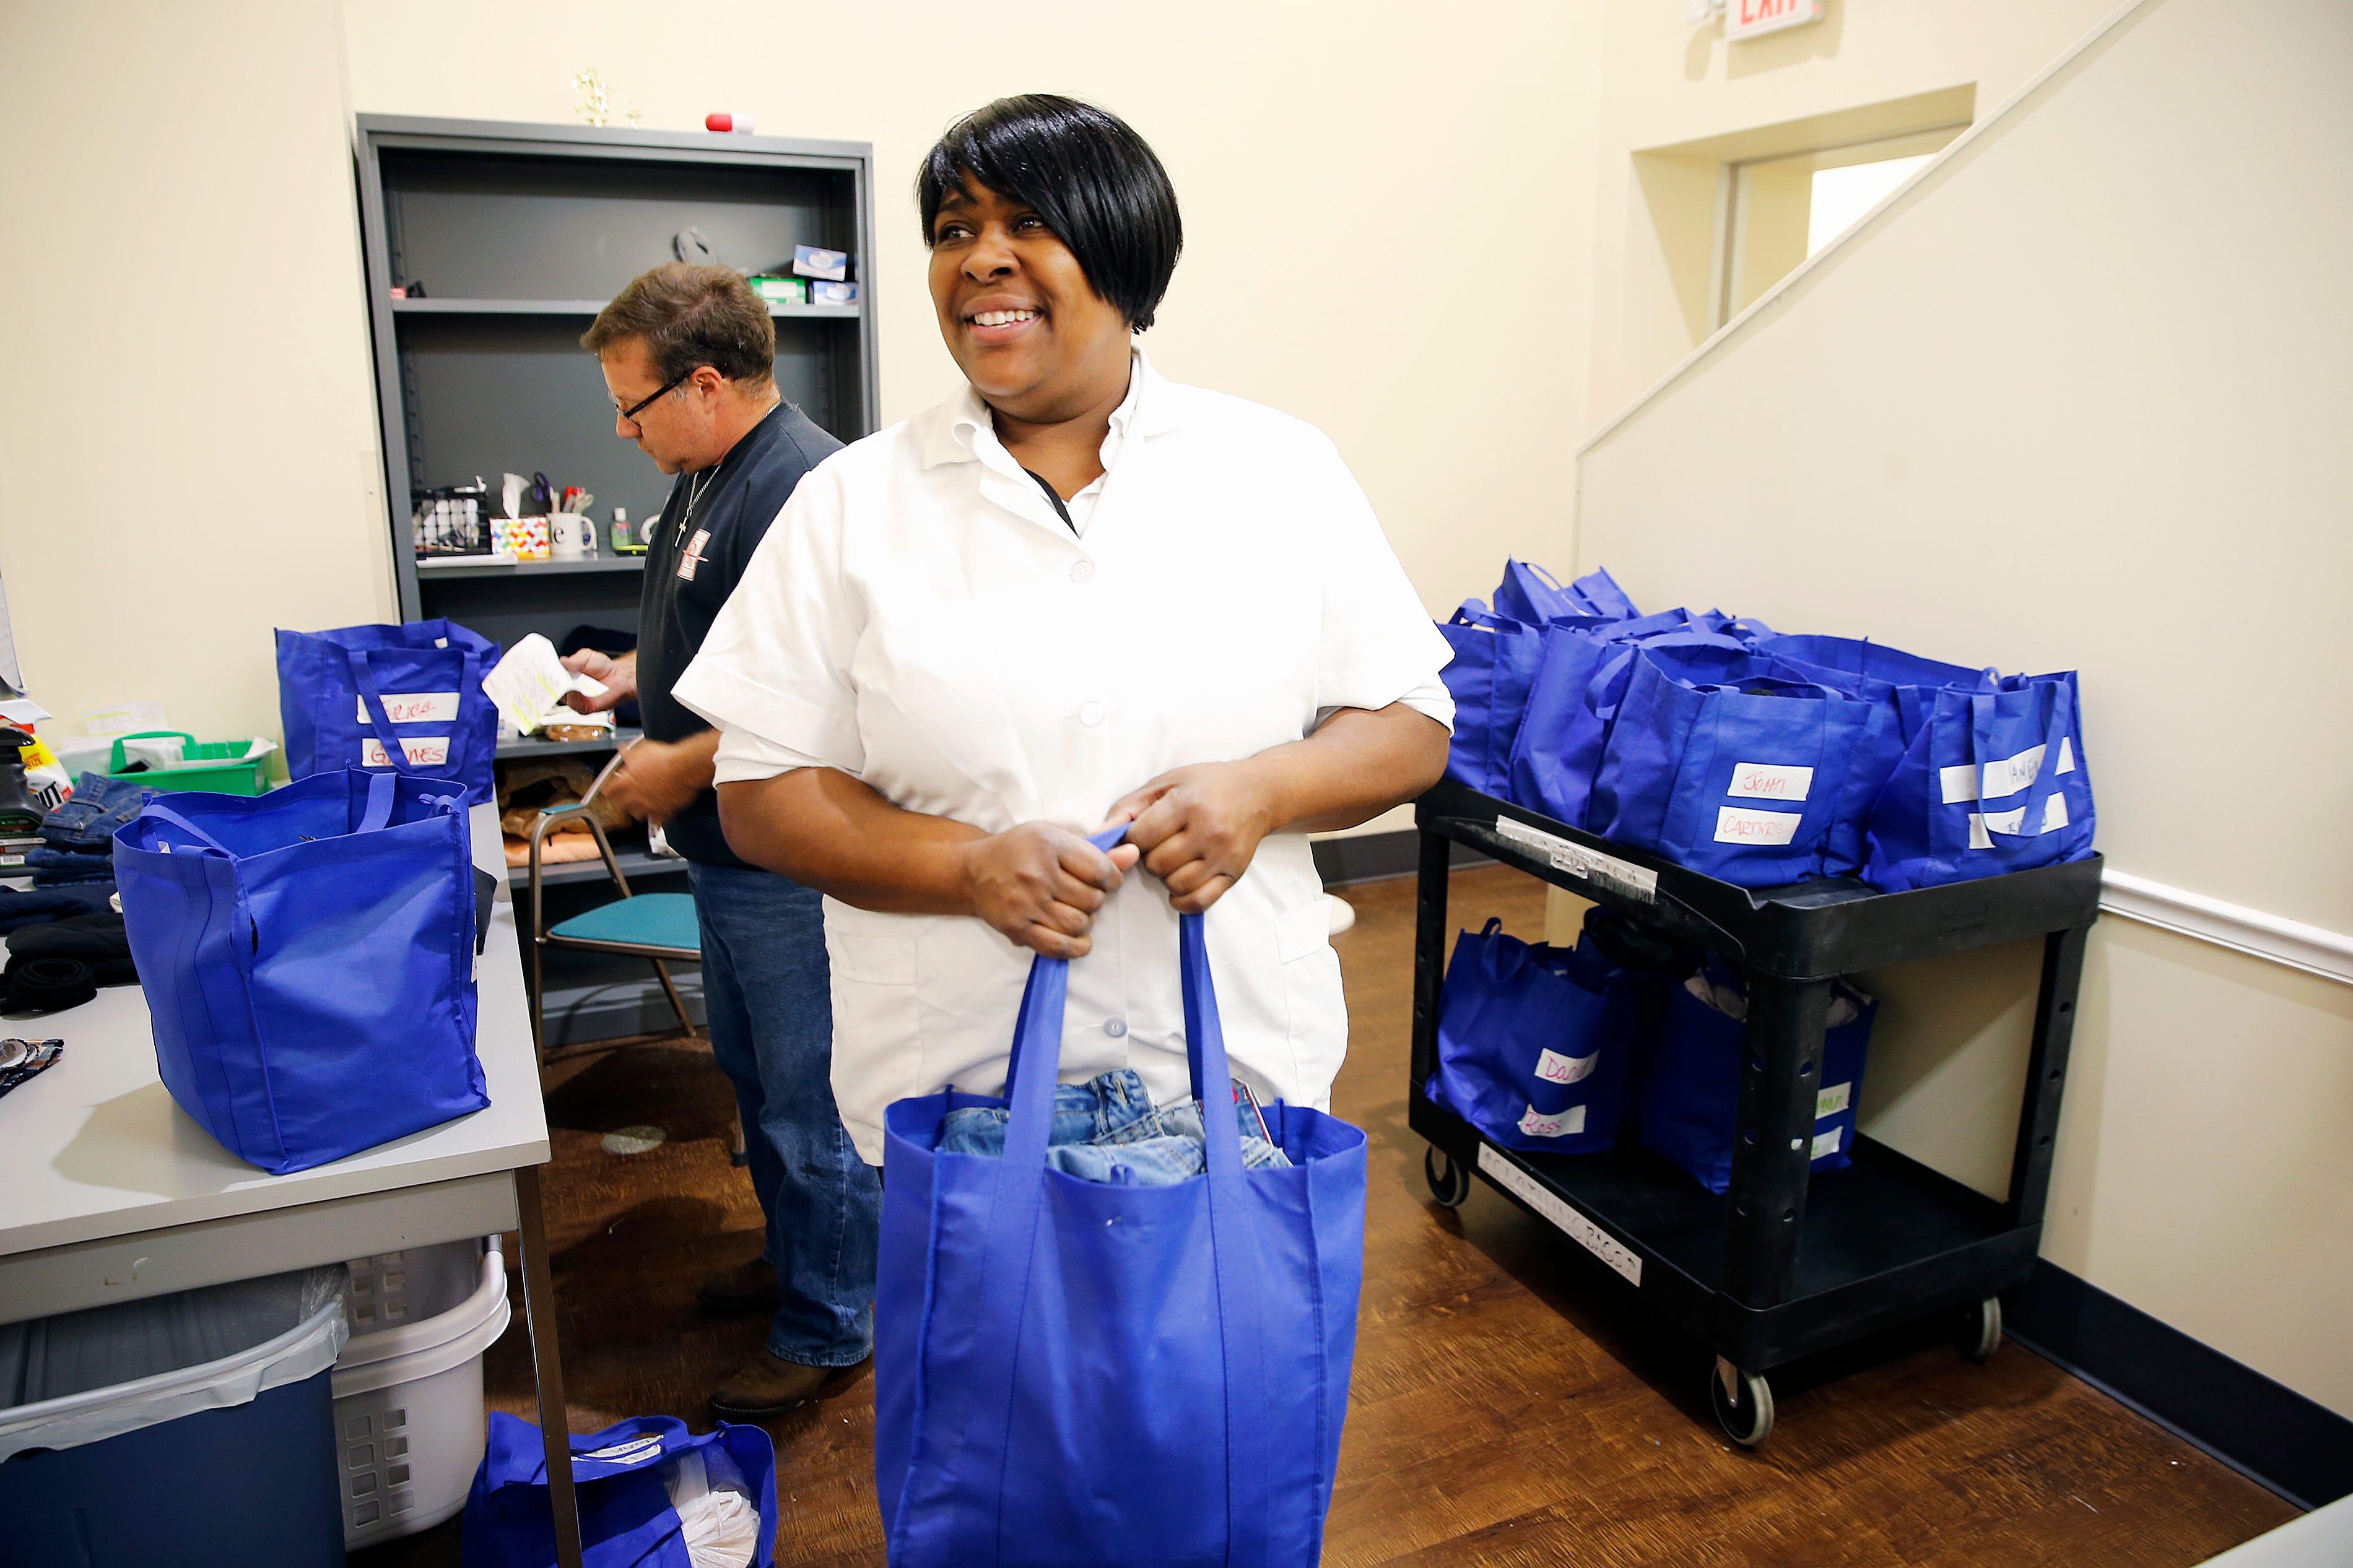 Showerhouse Helps Growing Number Of Cincinnati Homeless After Move